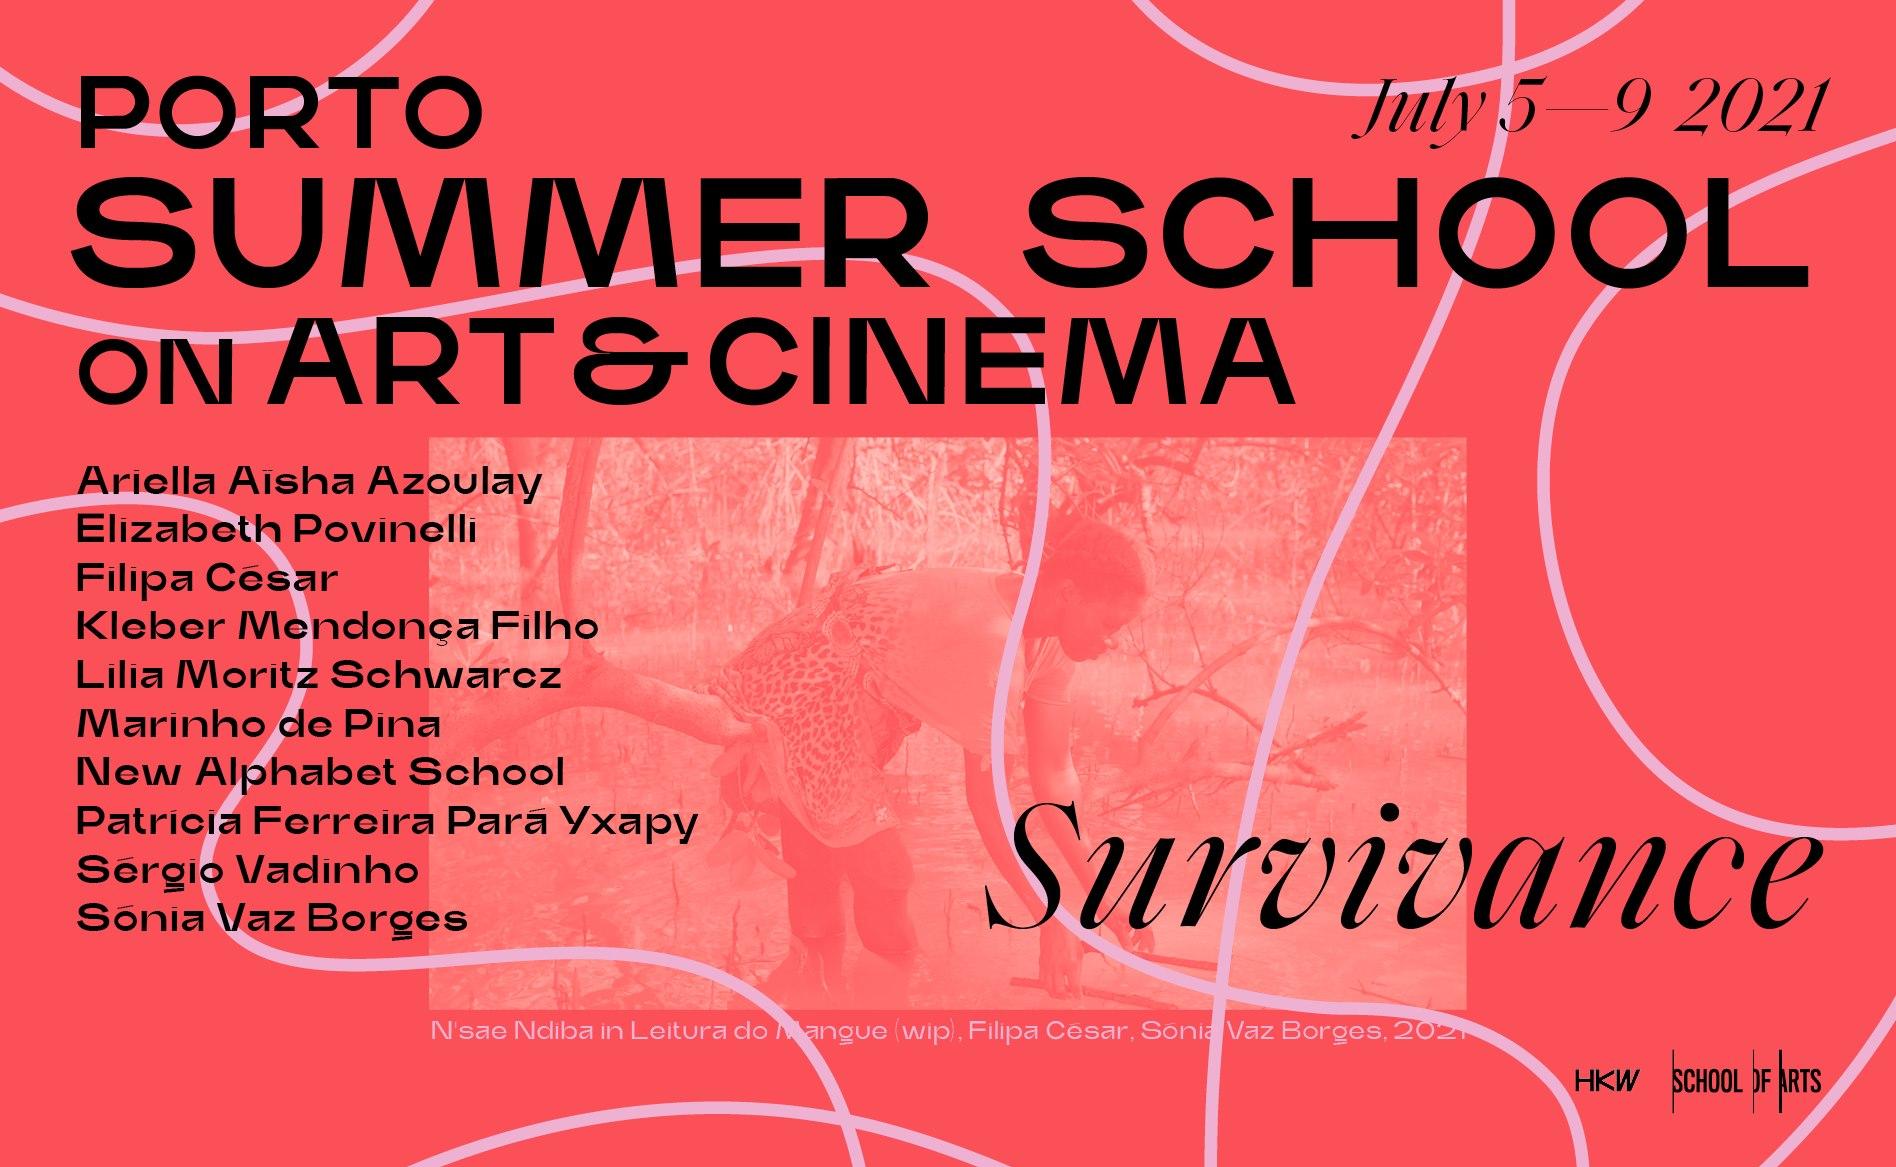 Call for Applications: Porto Summer School on Art & Cinema 2021 : Survivance